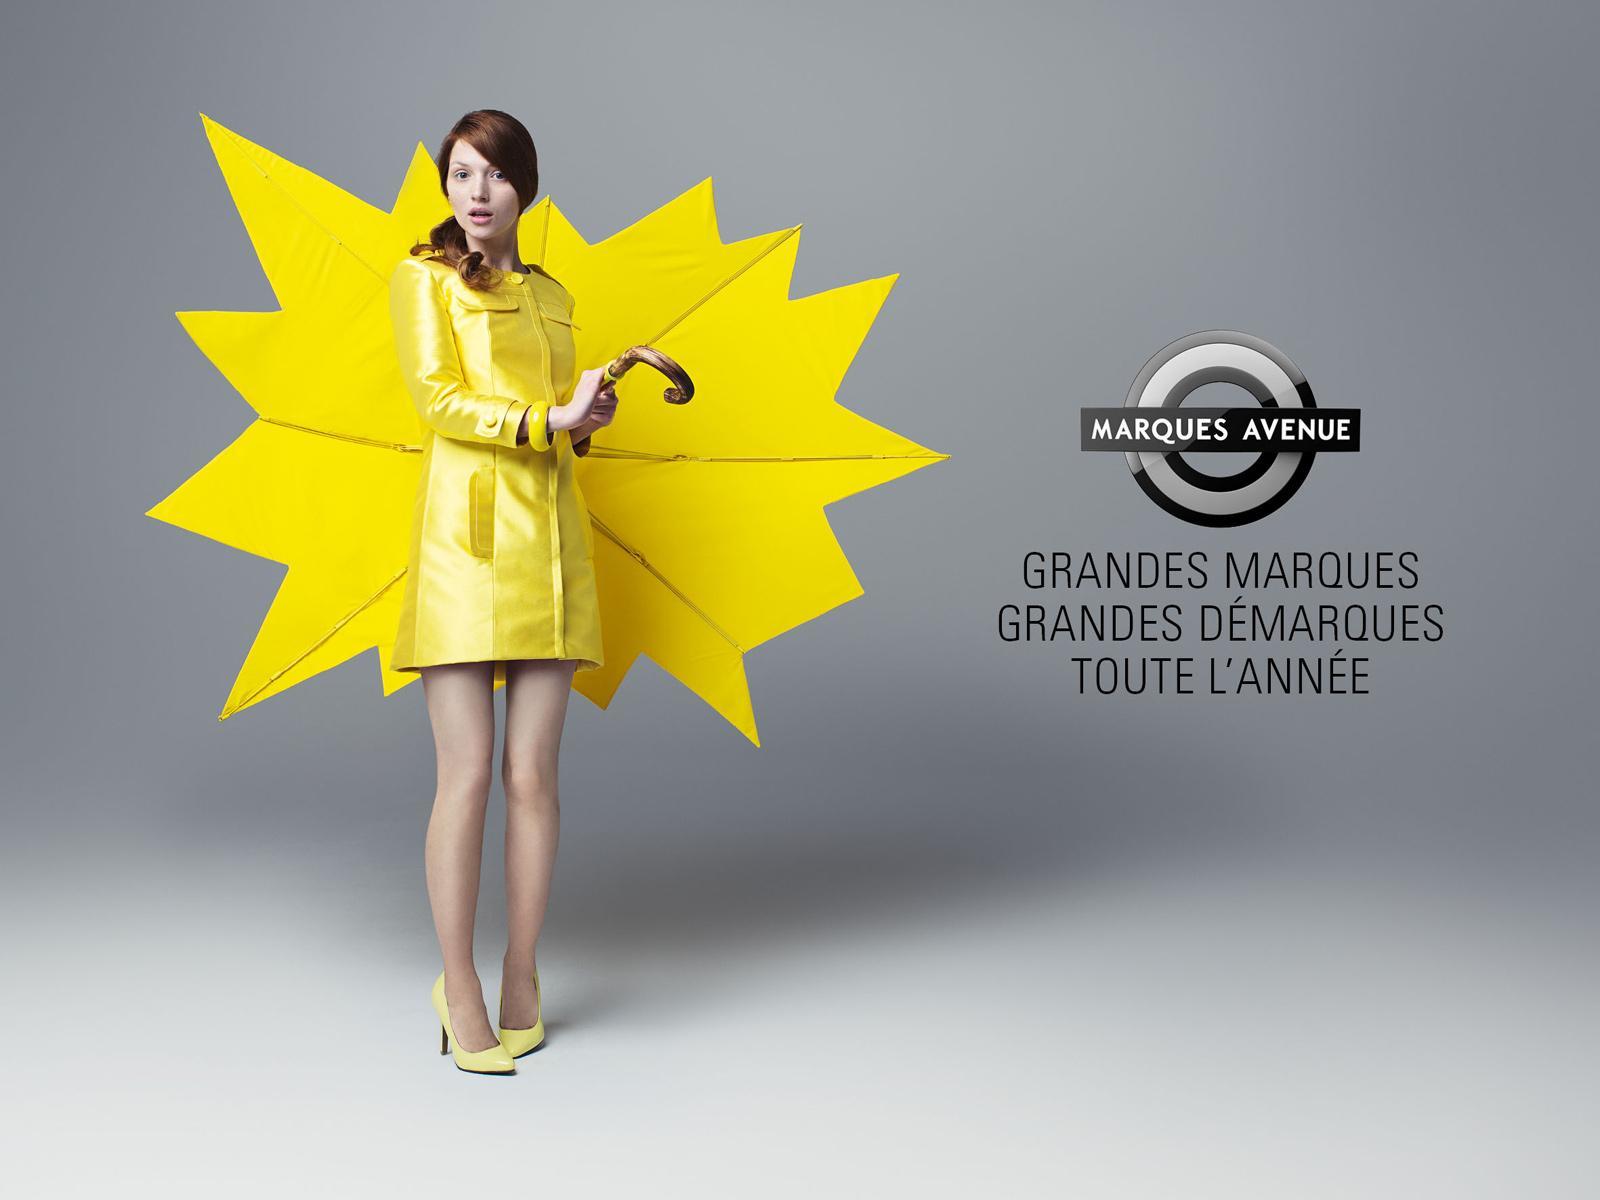 Marques Avenue Print Ad -  Special offers stickers, Umbrella